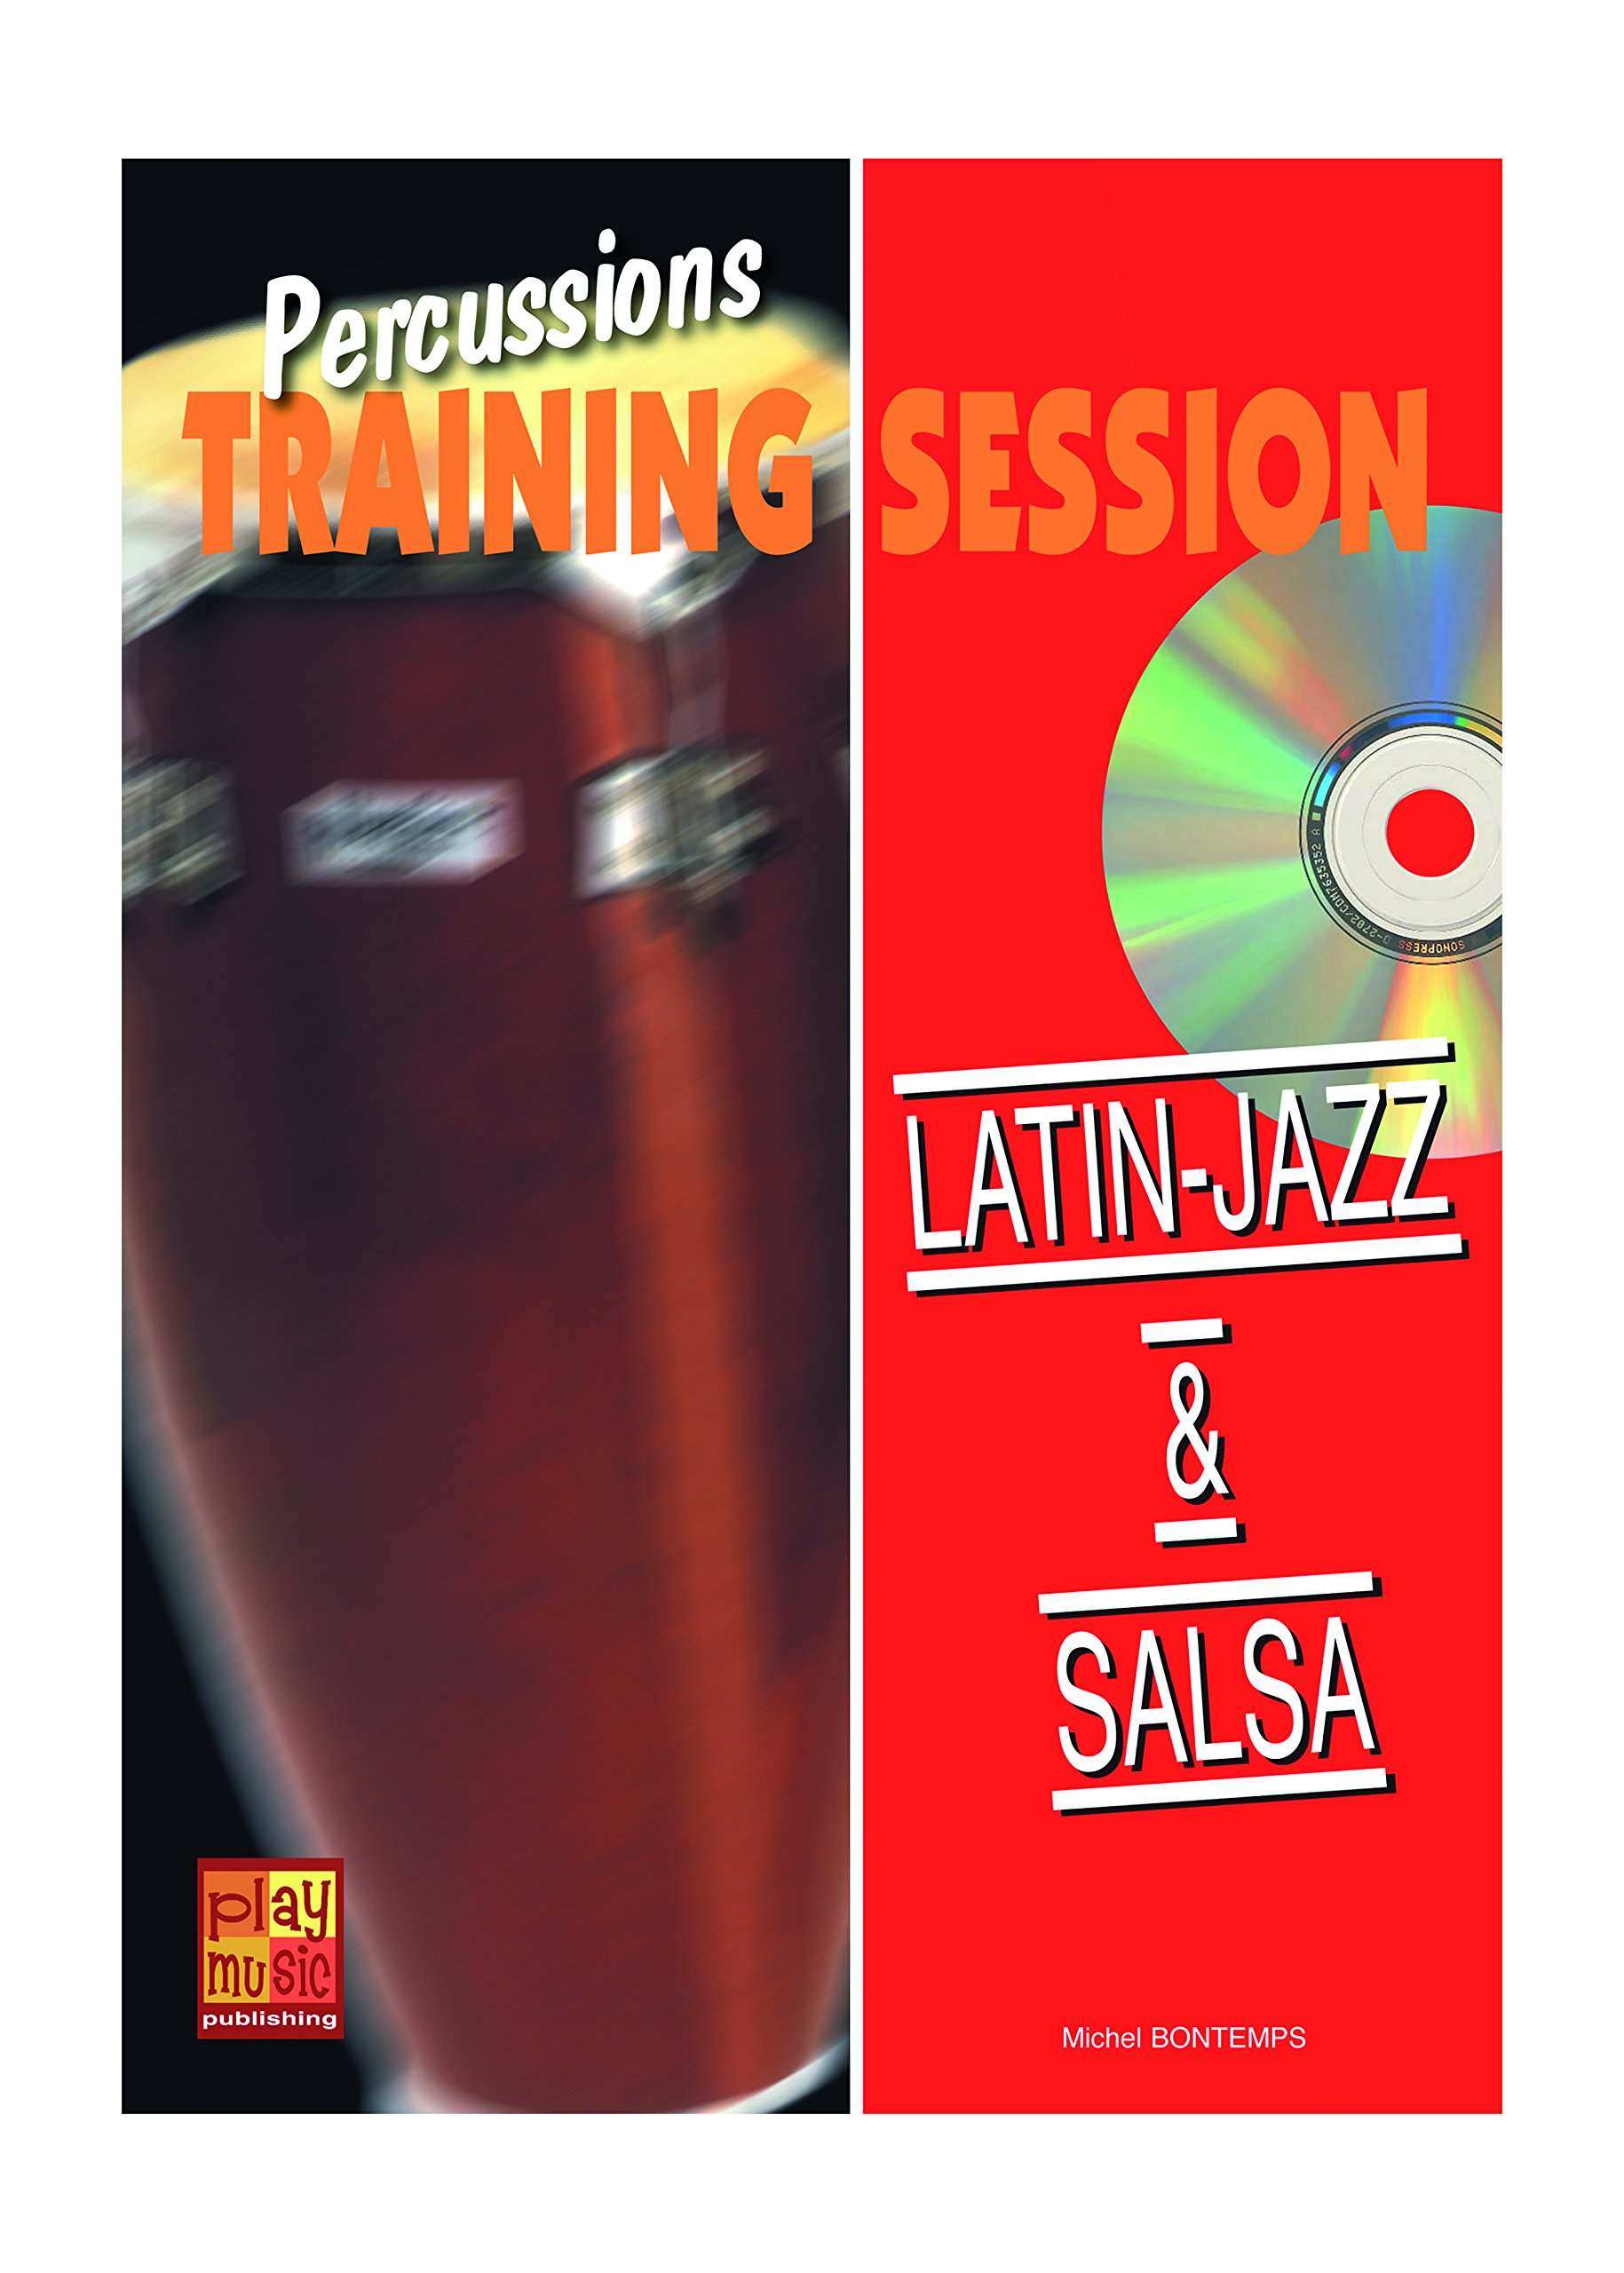 Latin-jazz & salsa +CD: Amazon co uk: Michel Bontemps, PLAY